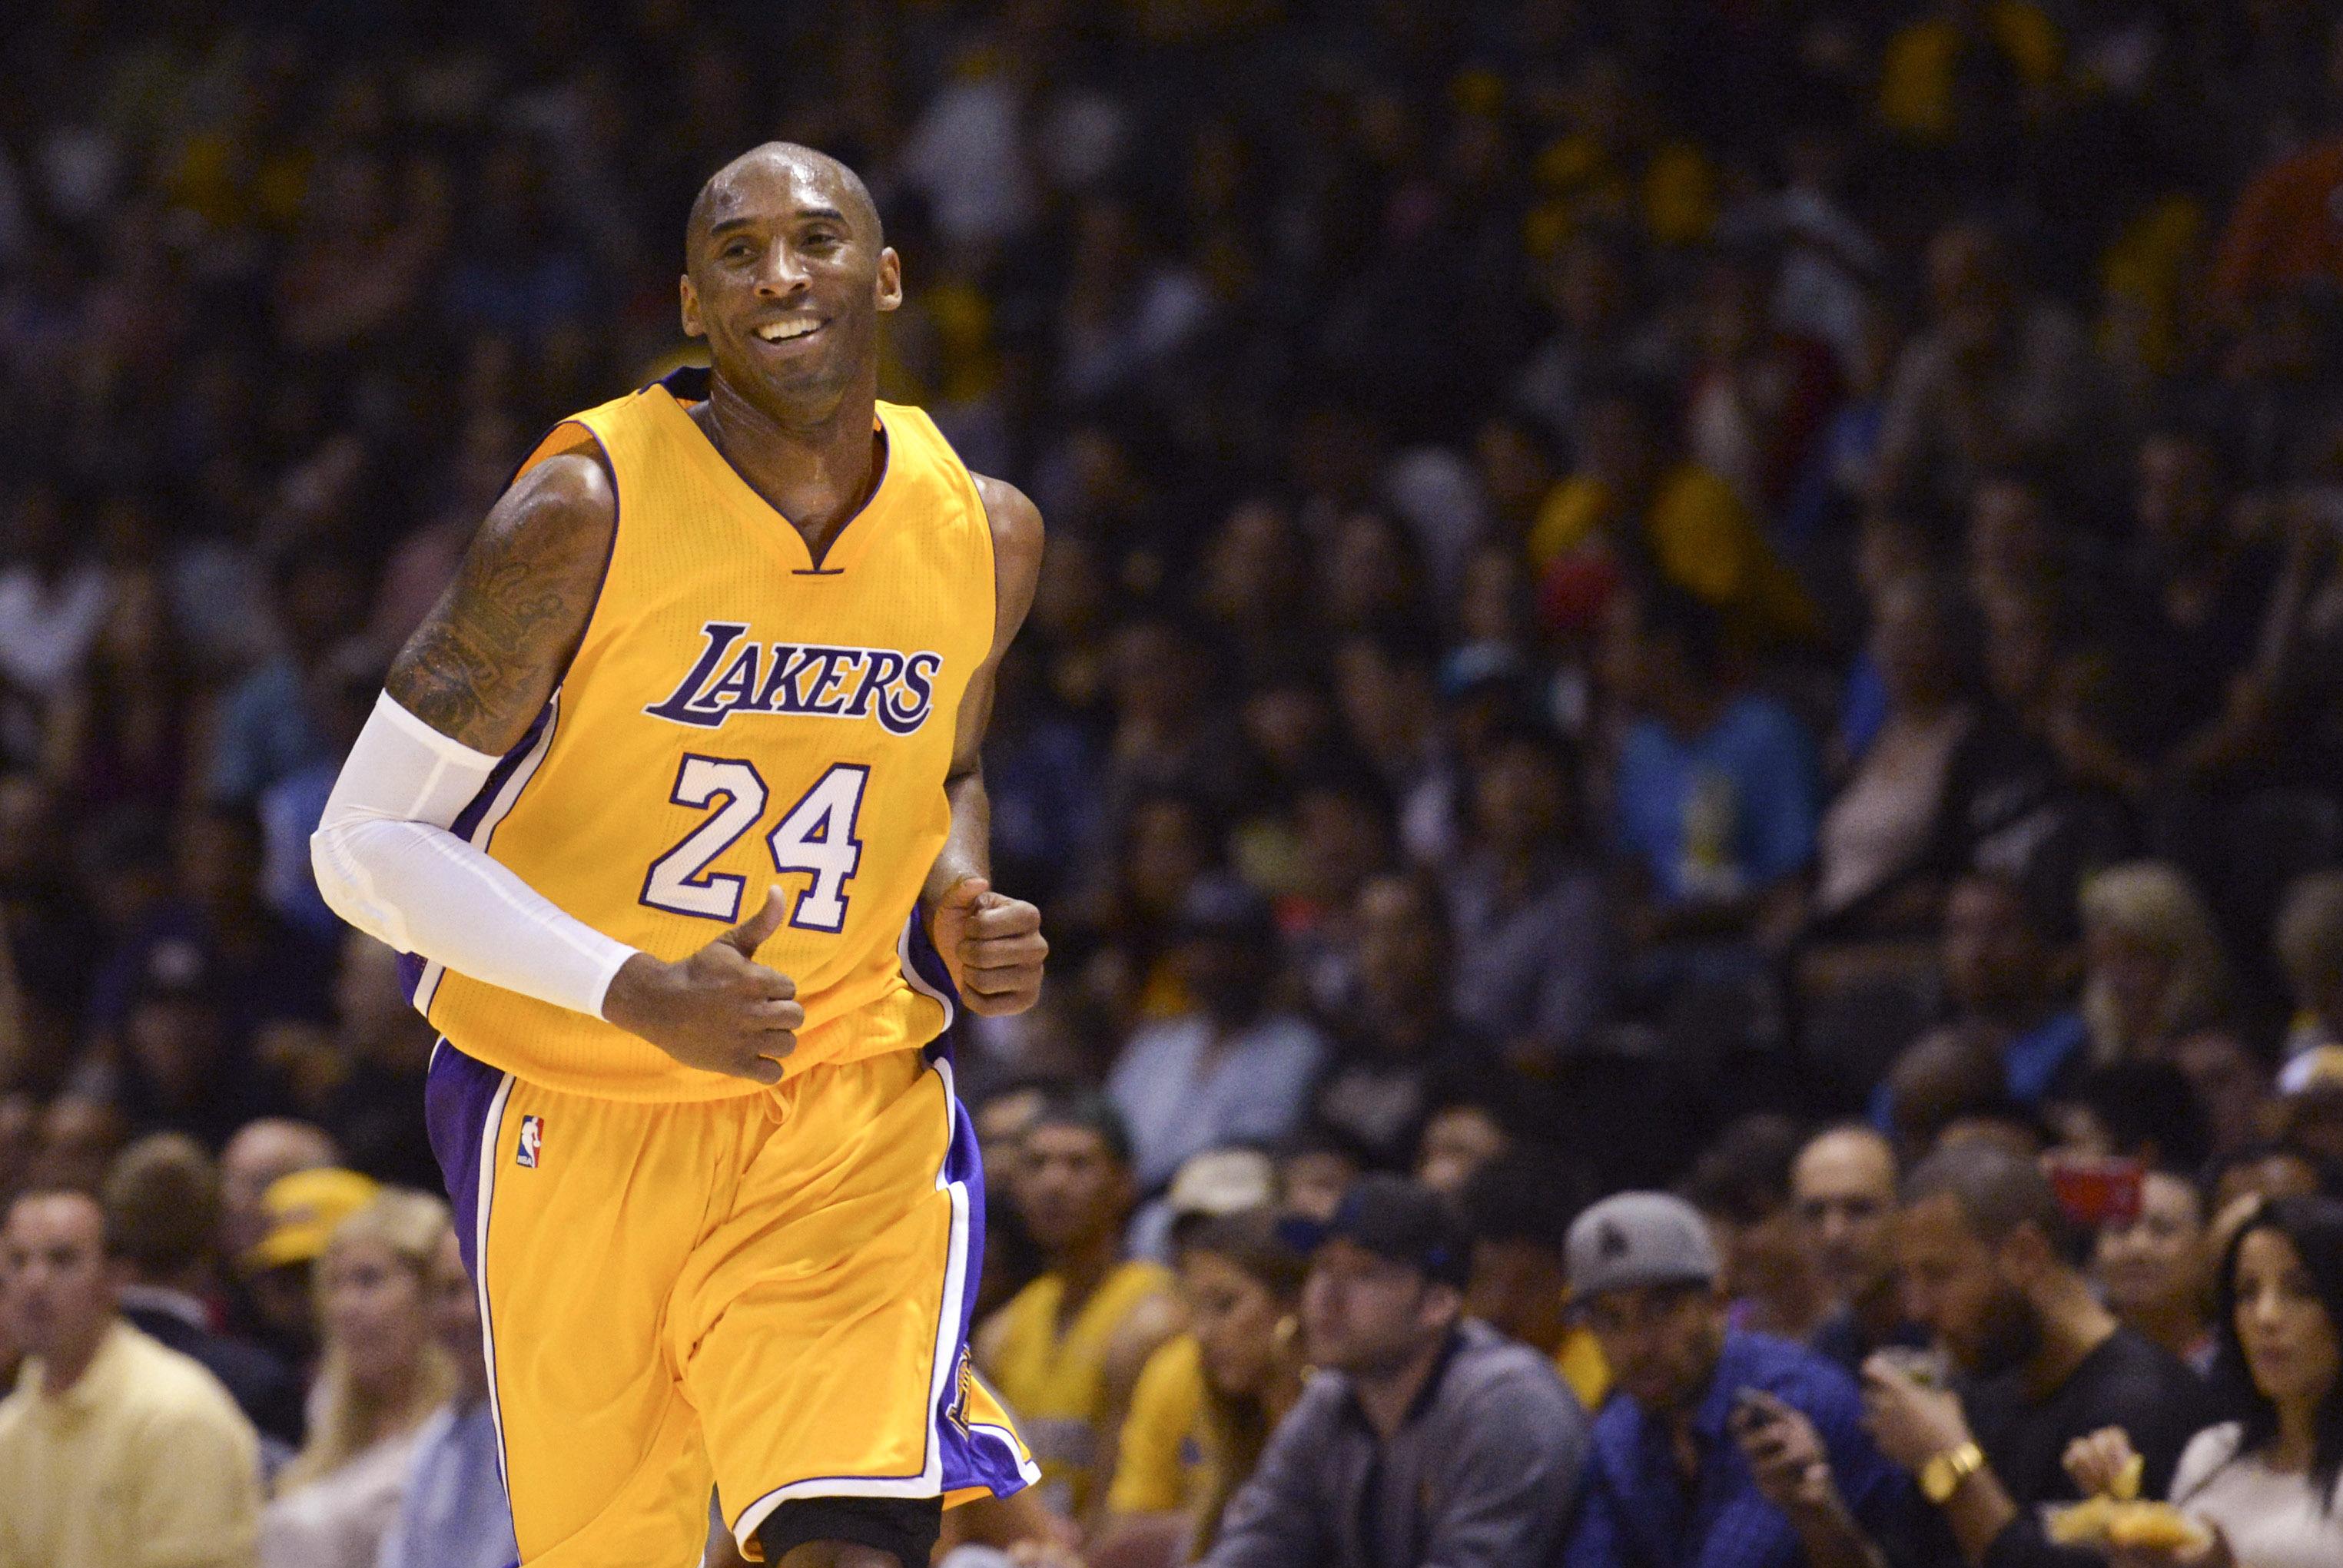 Kobe Bryant: Orthopaedic Surgeon Discusses Star's Achilles